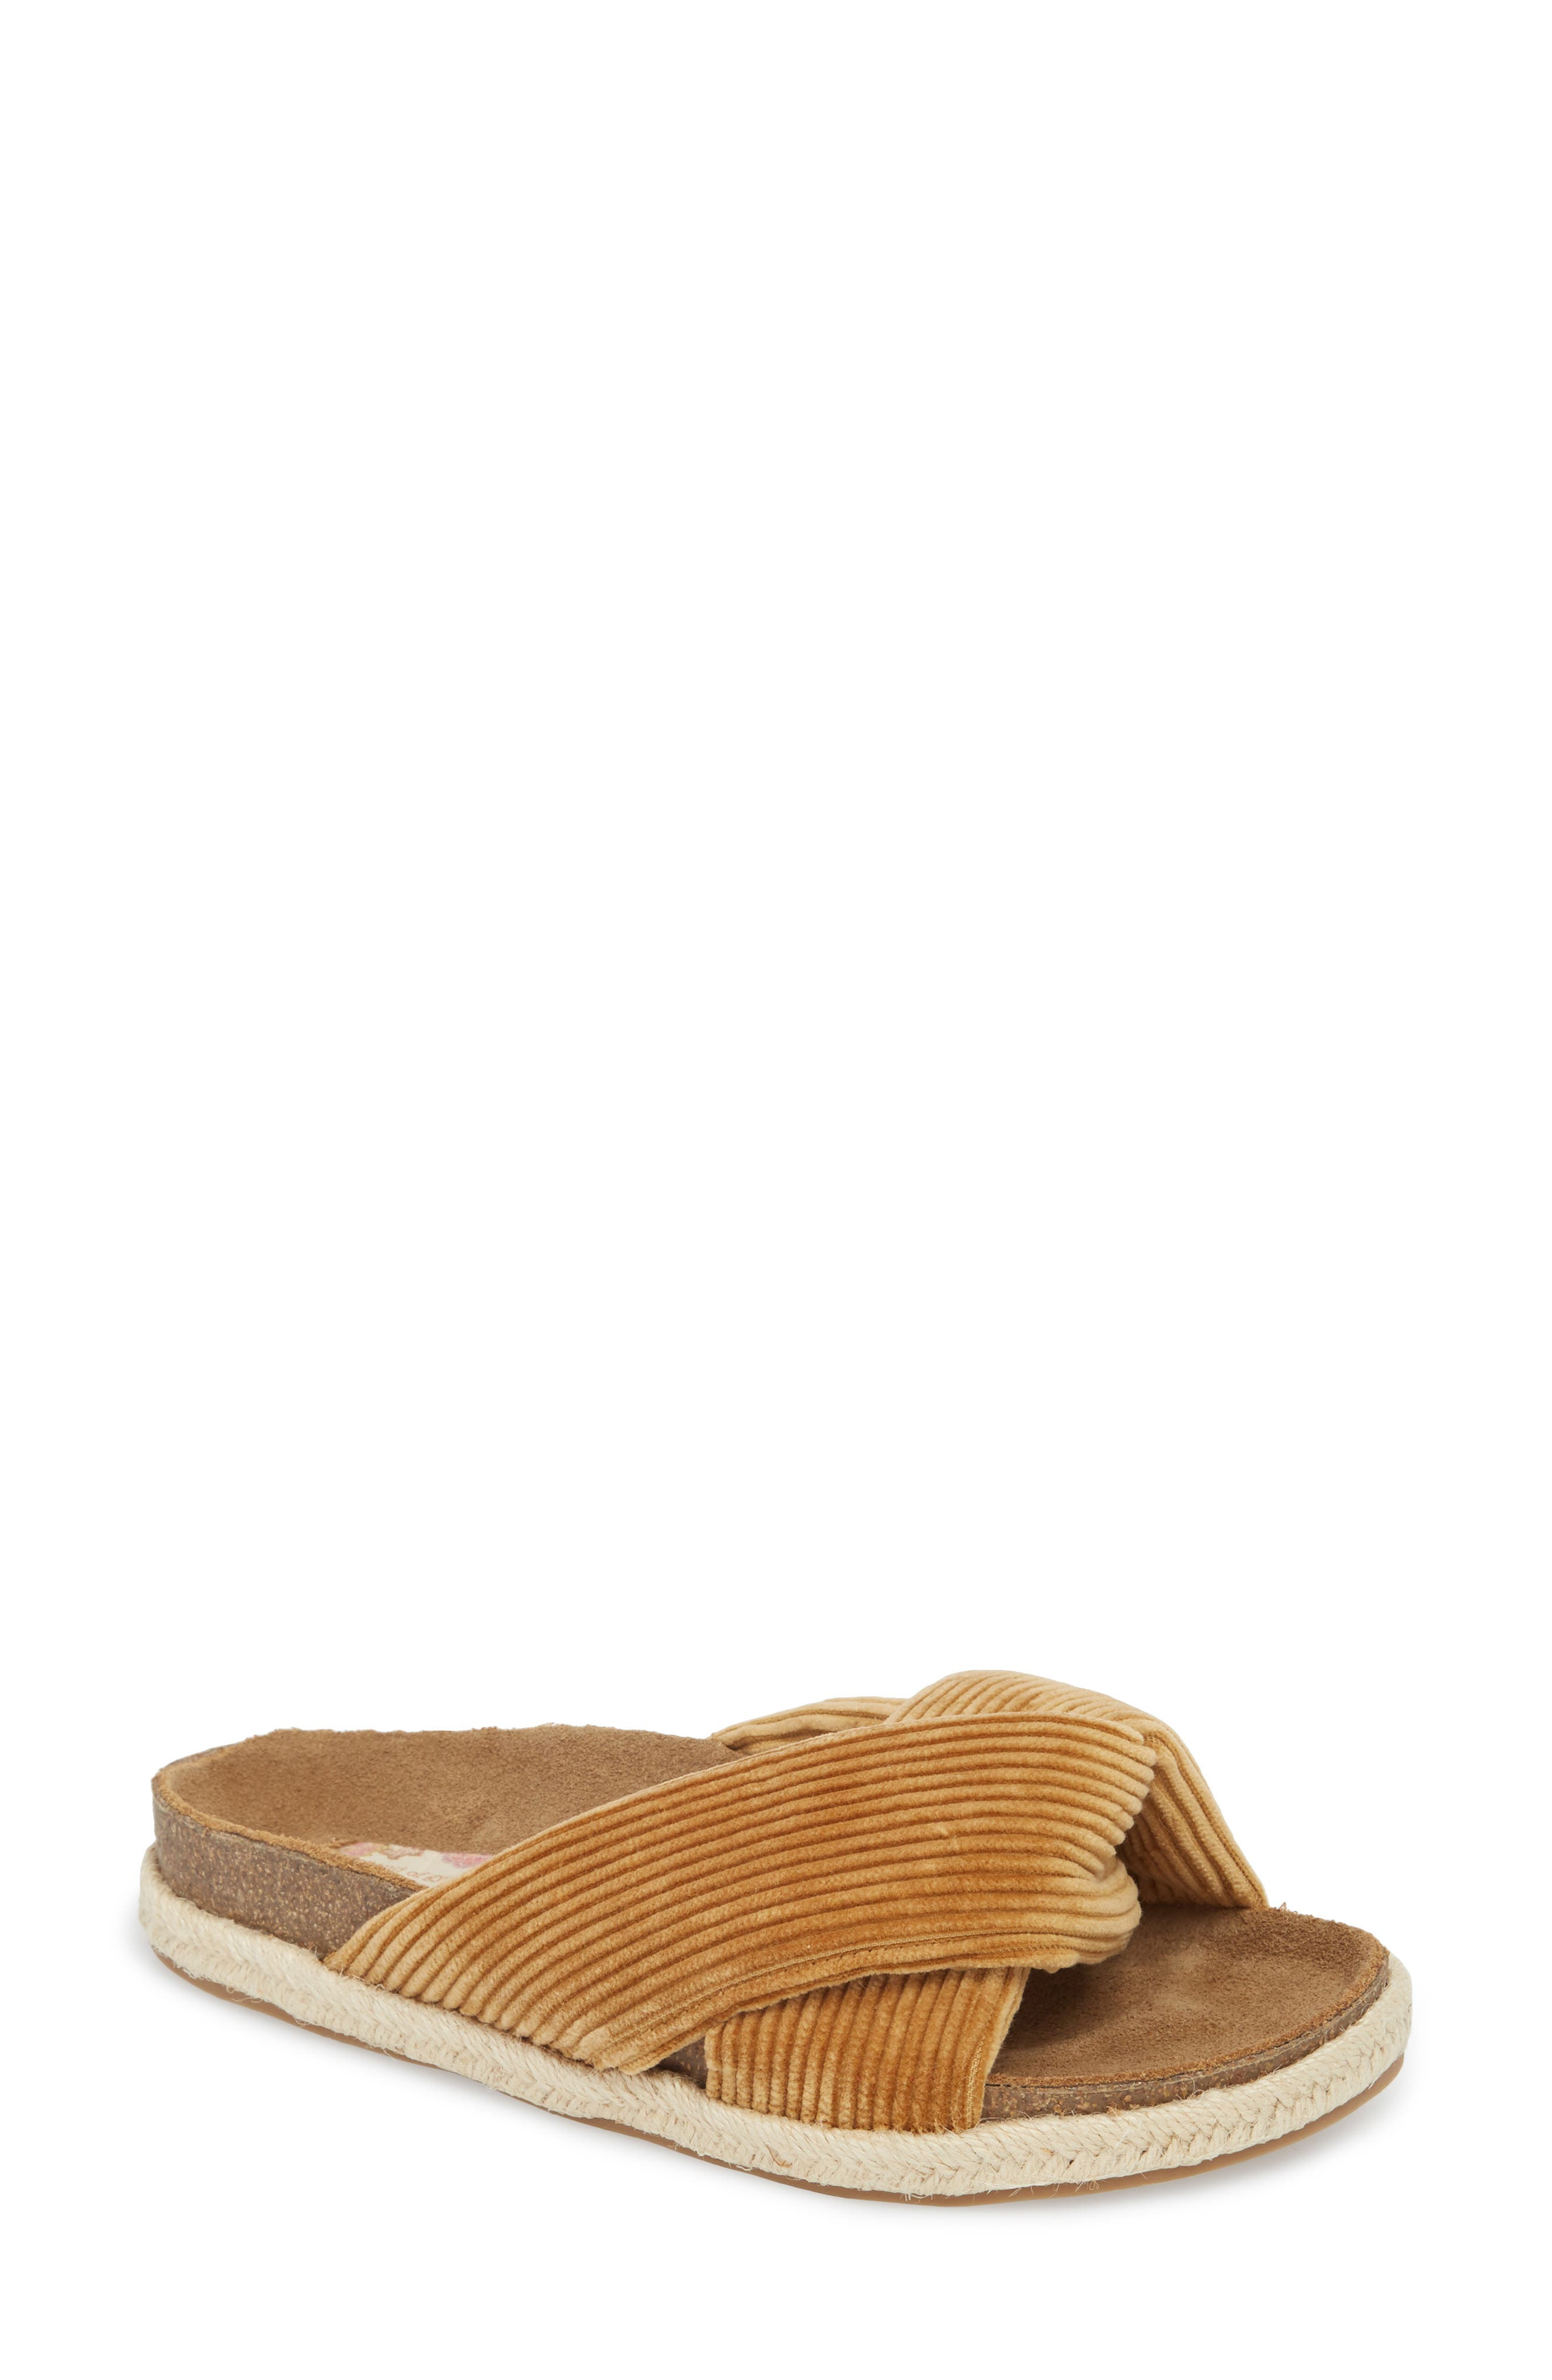 Move Over Flat Sandal,                         Main,                         color, Tan